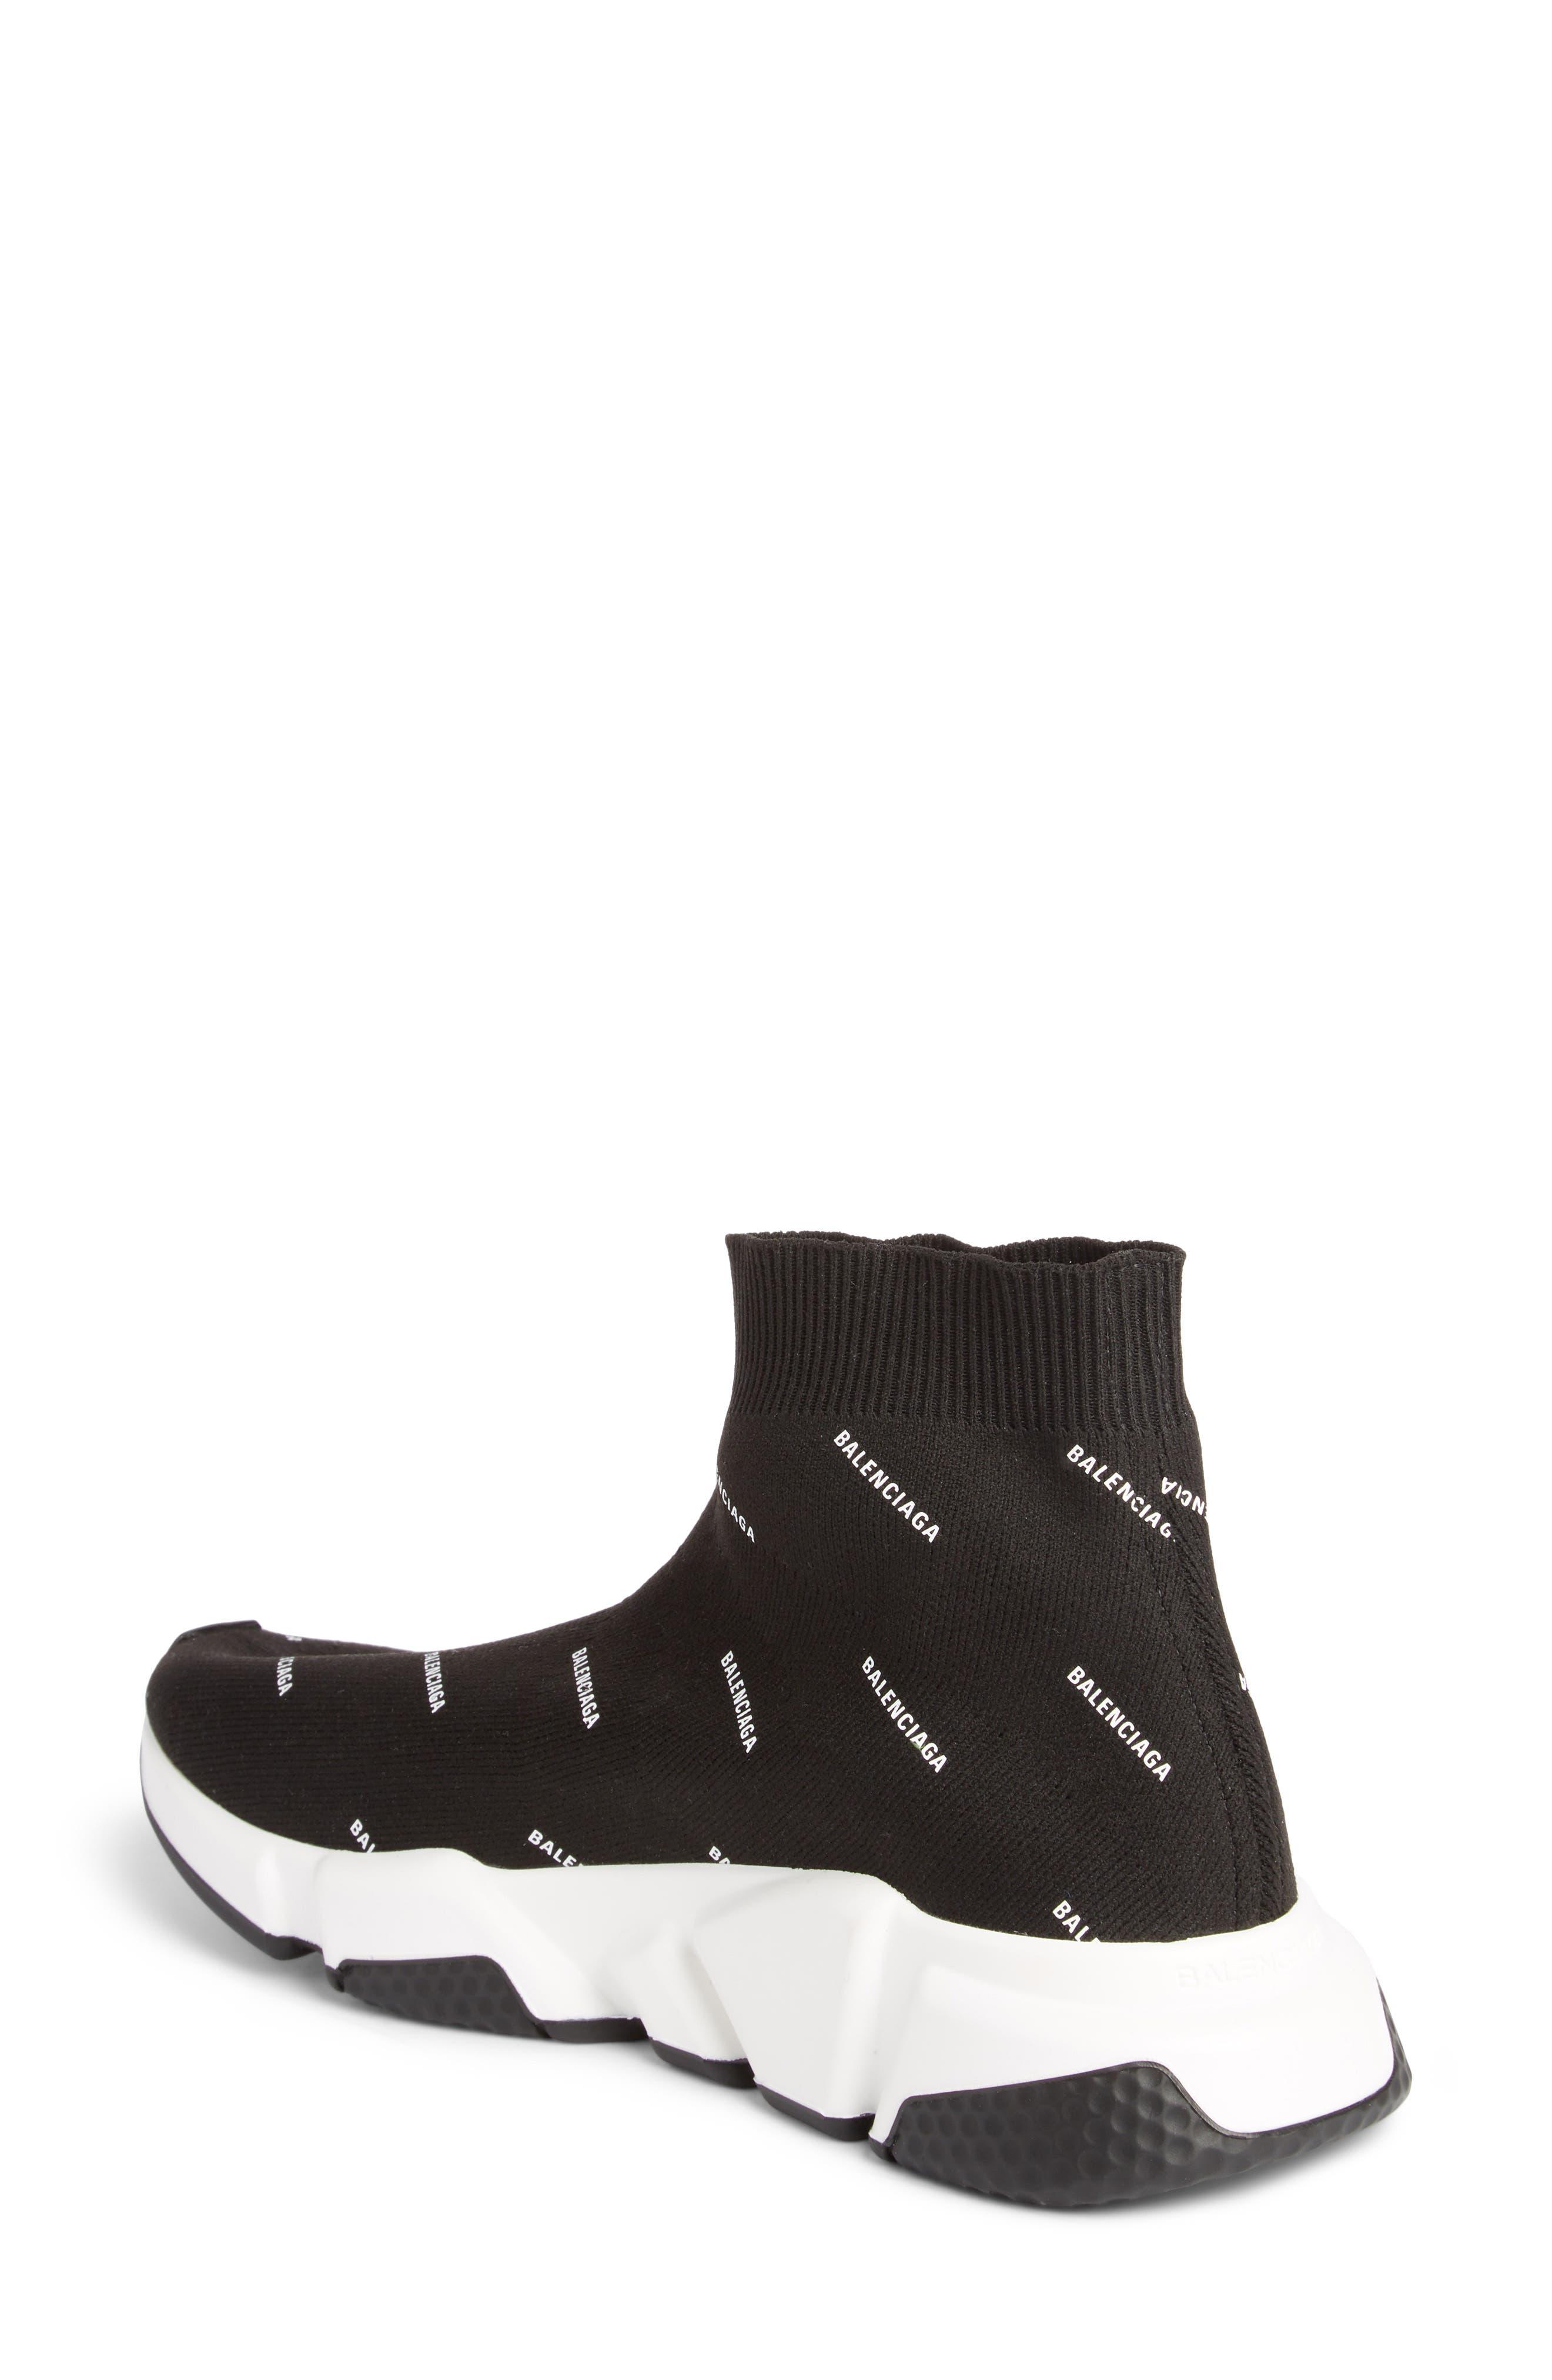 1ec3a0497f0 Women's Balenciaga Shoes | Nordstrom